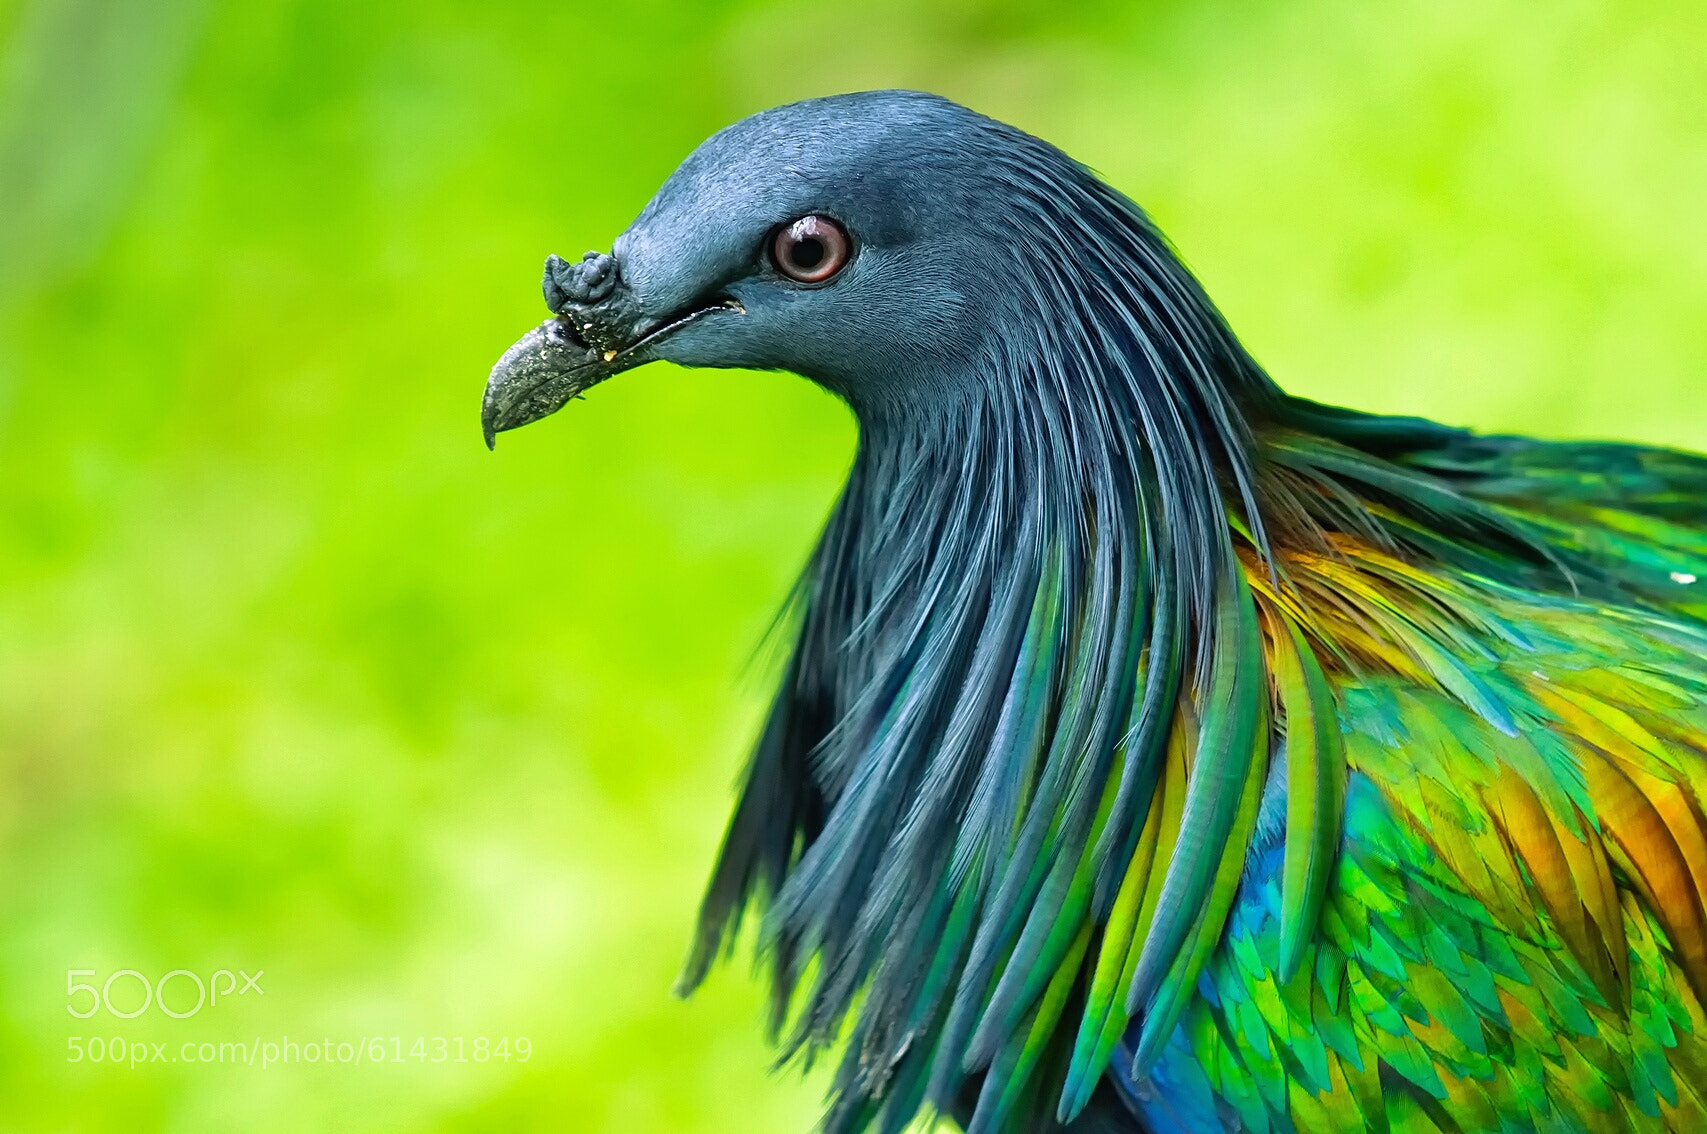 ... Creatures - Odd on Pinterest | Mammals, Endangered Species and Extinct Endemic Species Nicobar Pigeon